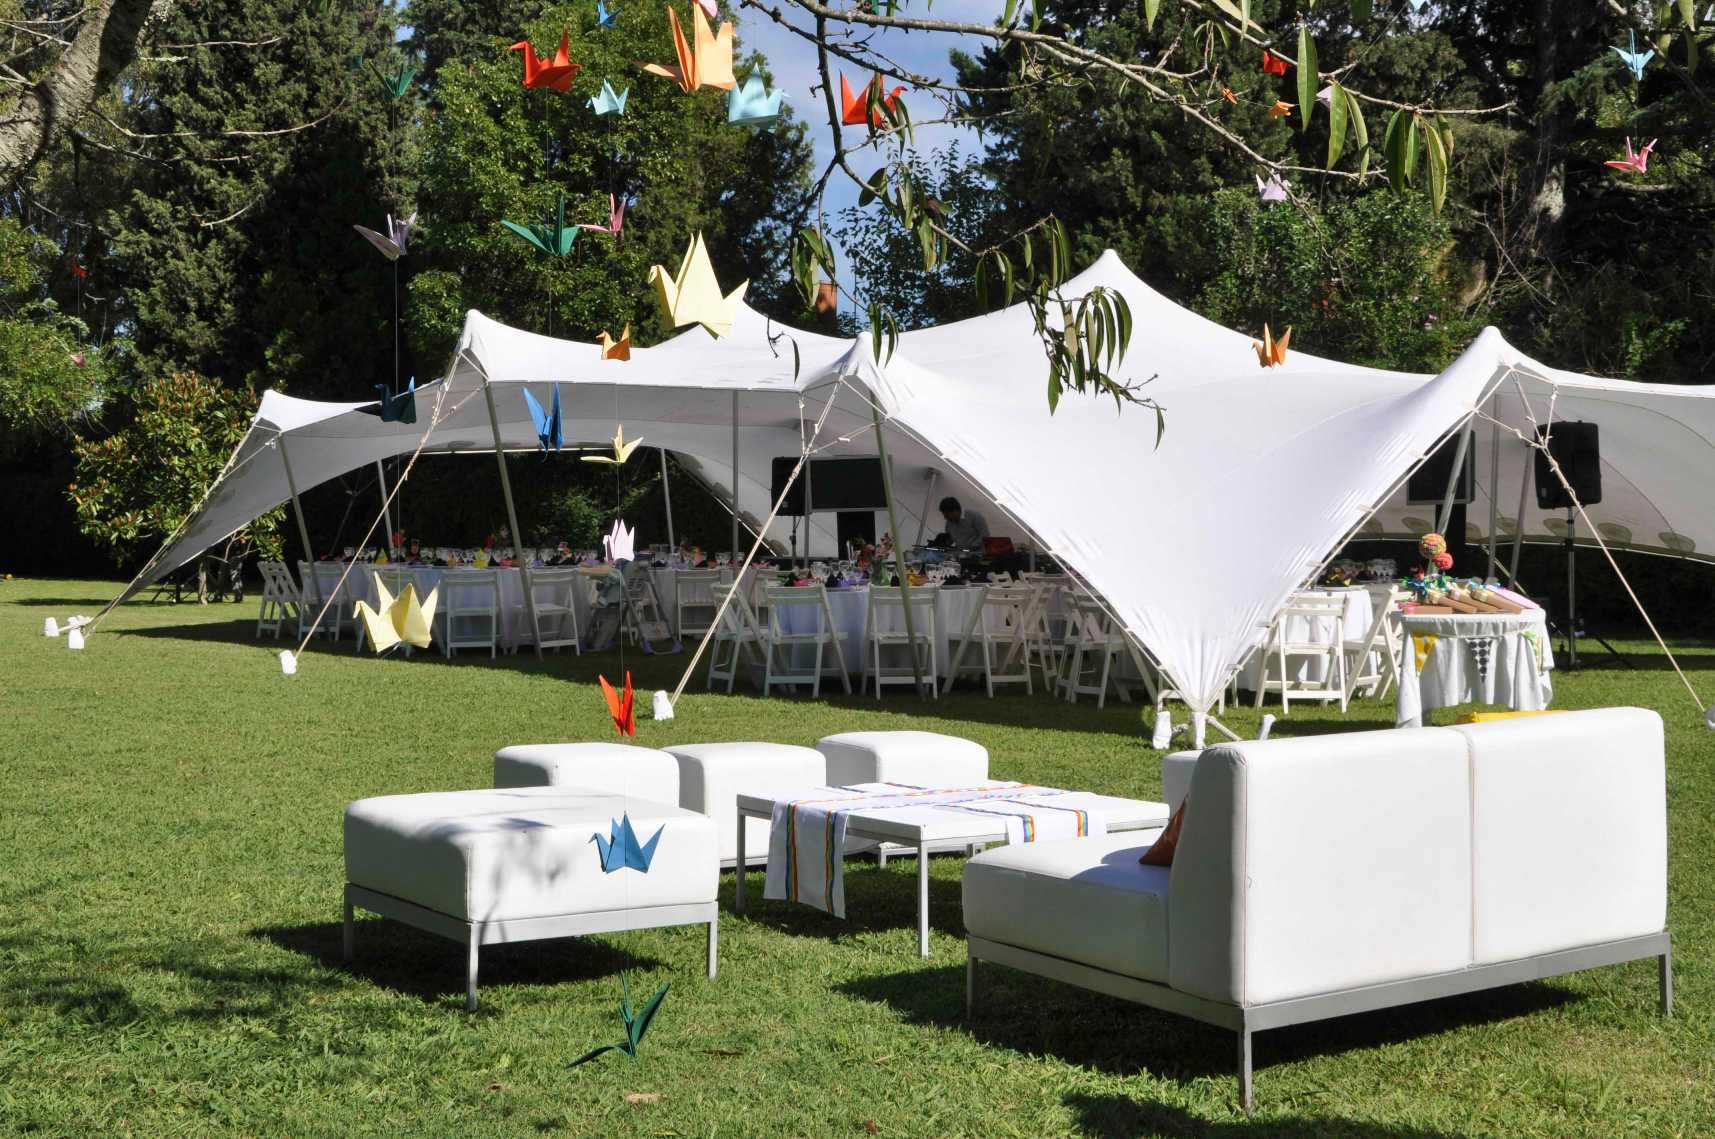 Carpas para eventos y carpas beduinas de tentickle tents for Carpas para jardin